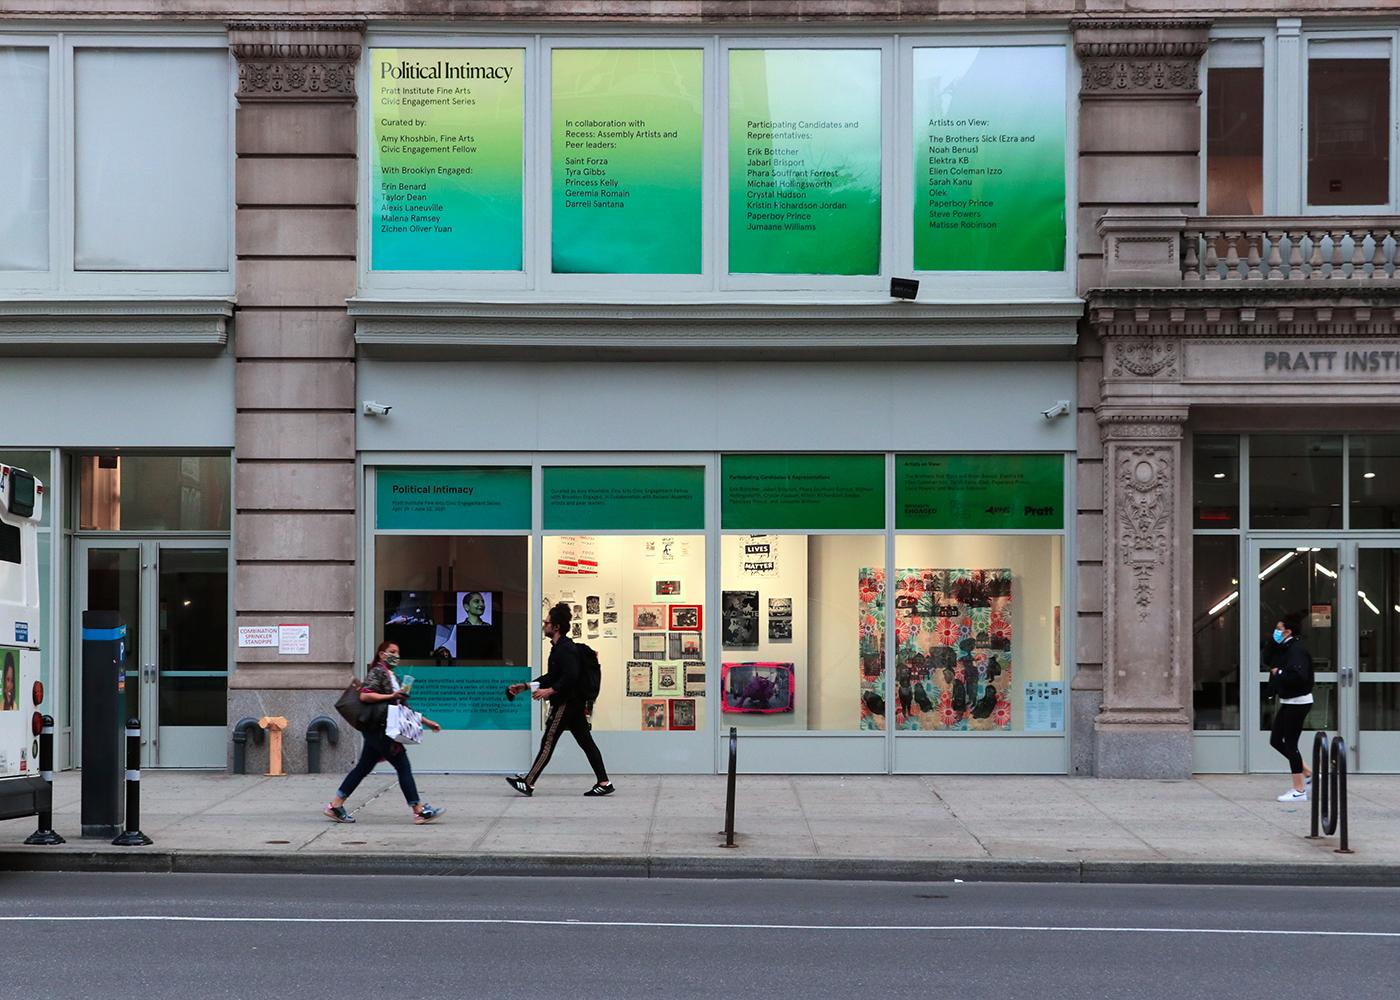 Installation view of 'Political Intimacy' in the Pratt Manhattan Gallery windows